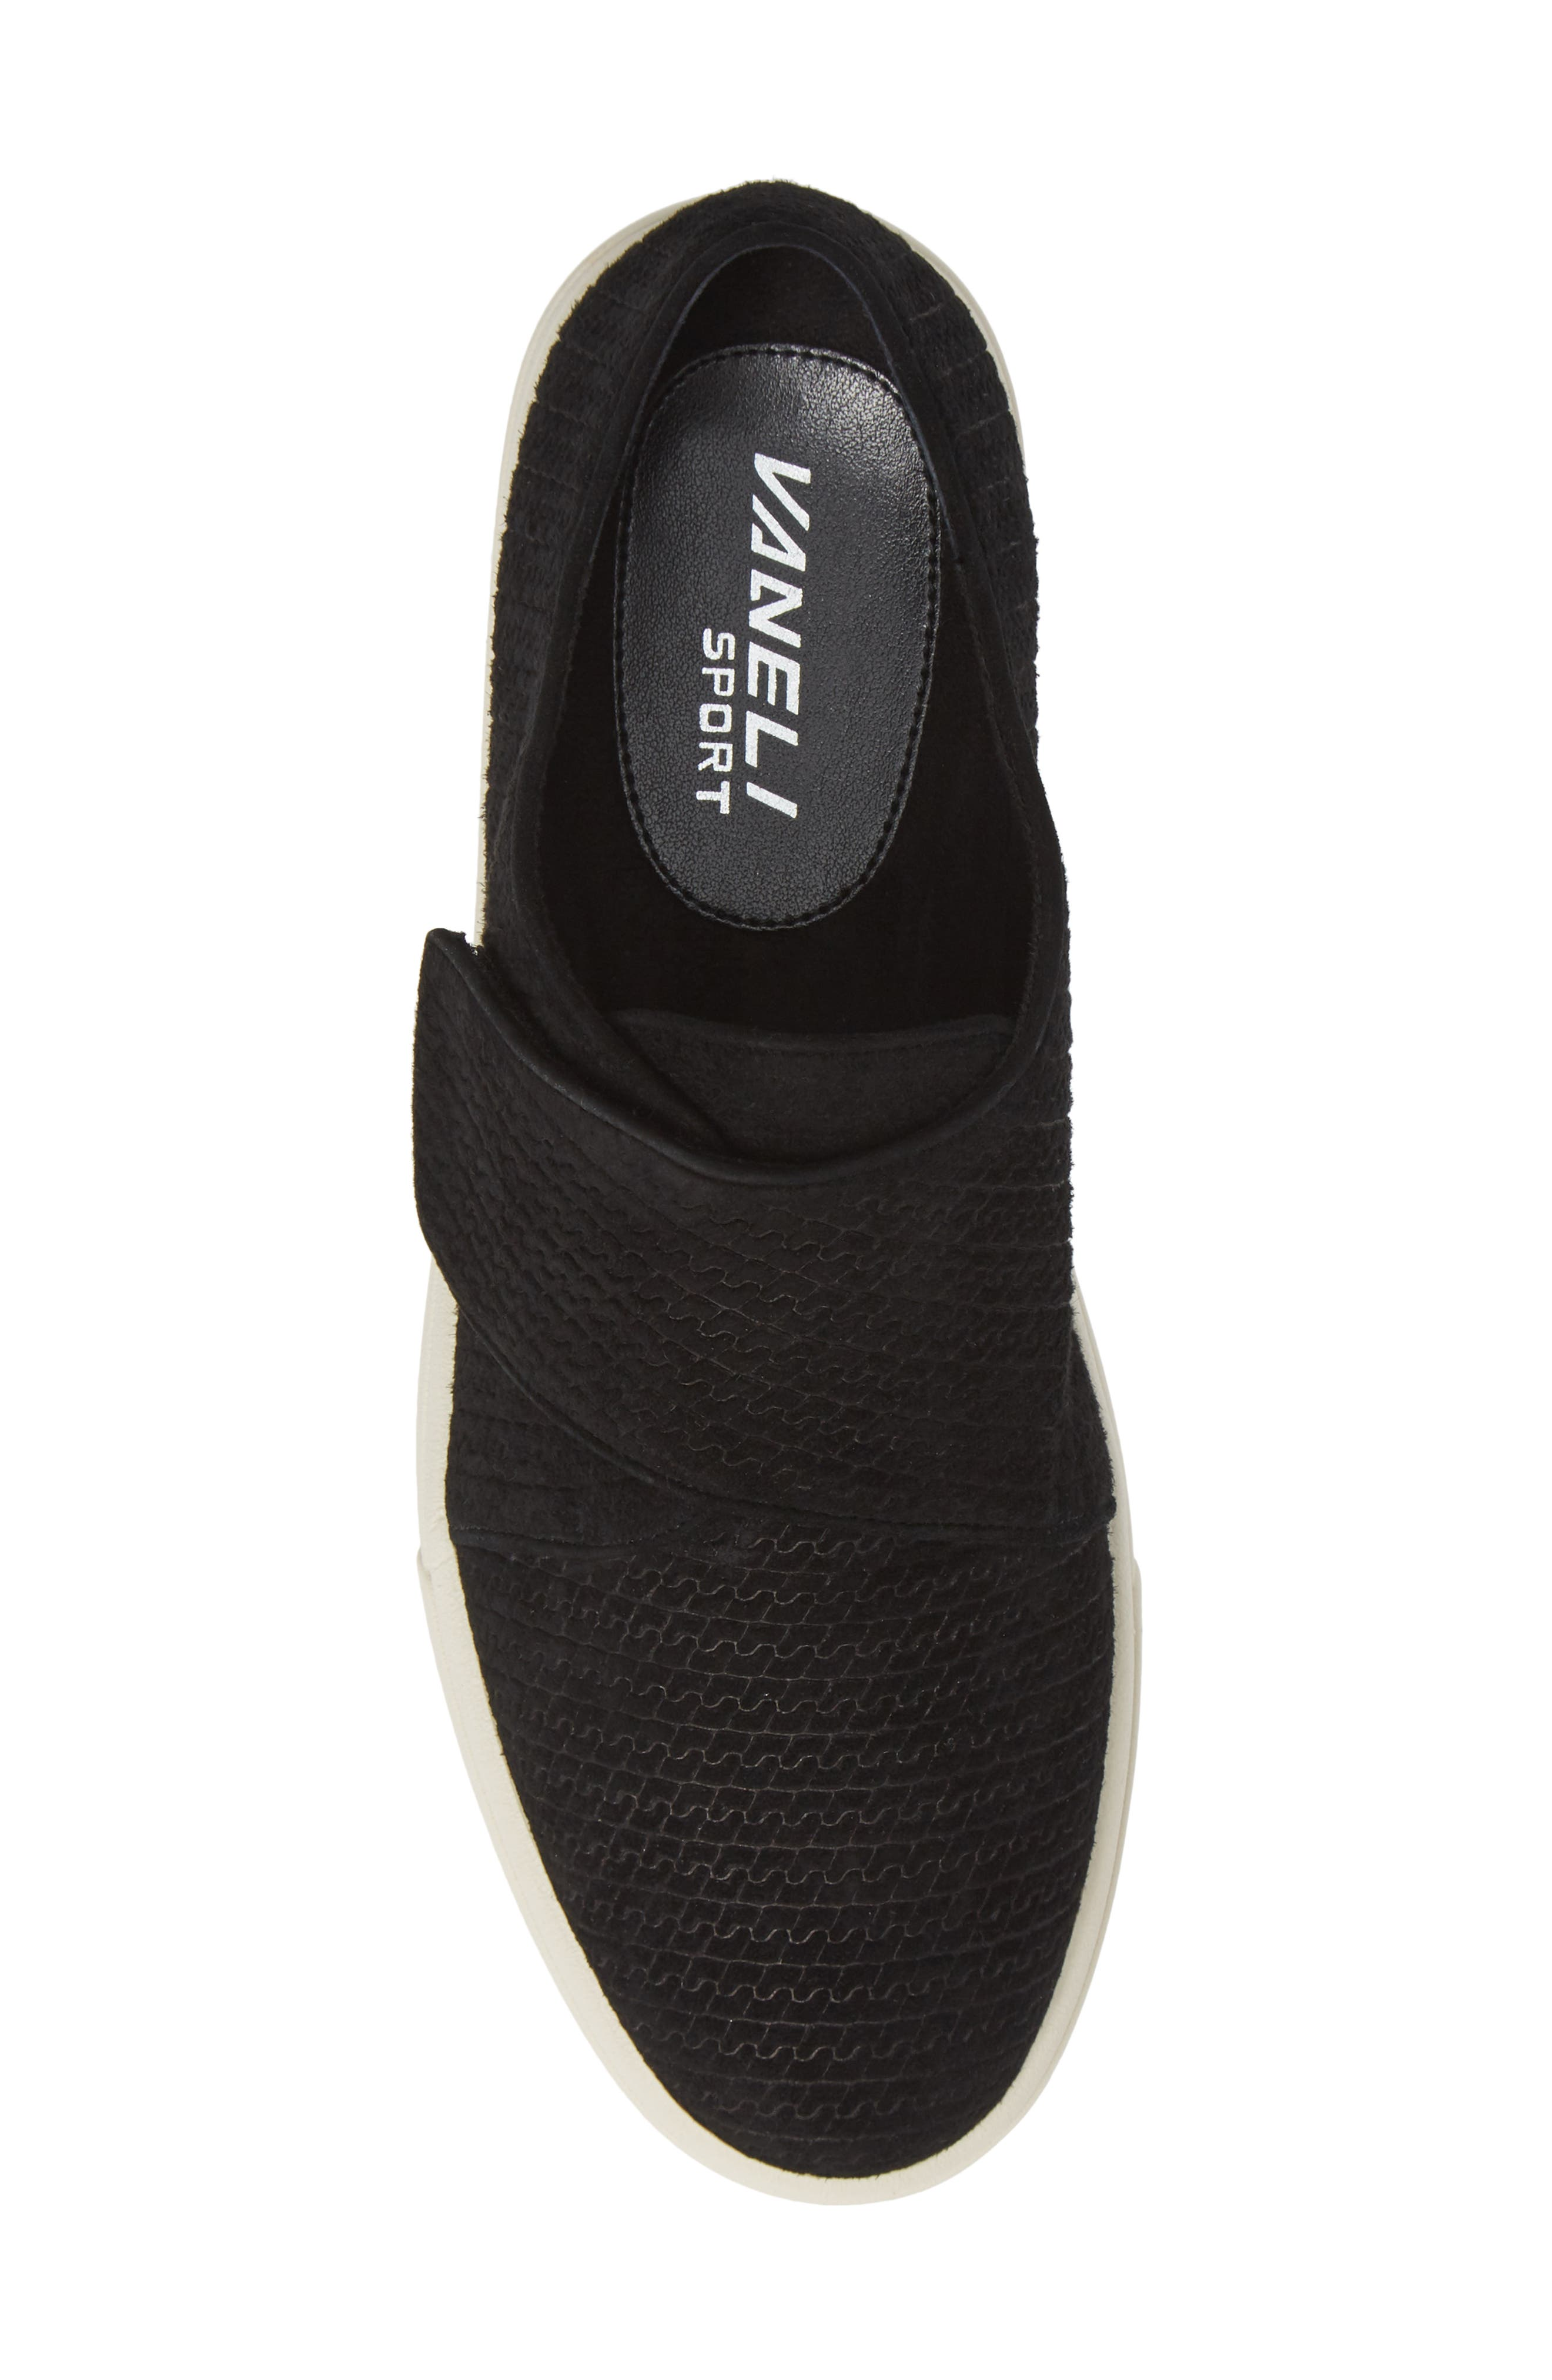 VANELI,                             Oberon Slip-On Sneaker,                             Alternate thumbnail 5, color,                             BLACK SUEDE